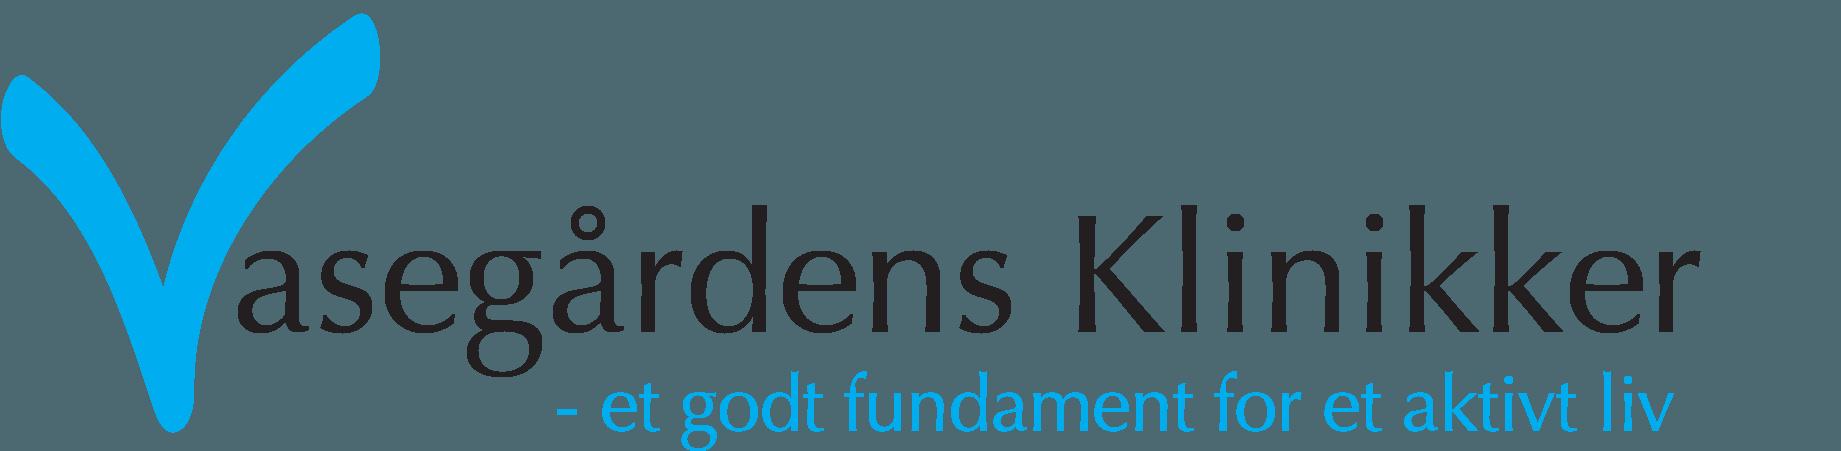 Vasegårdens Klinikker Logo